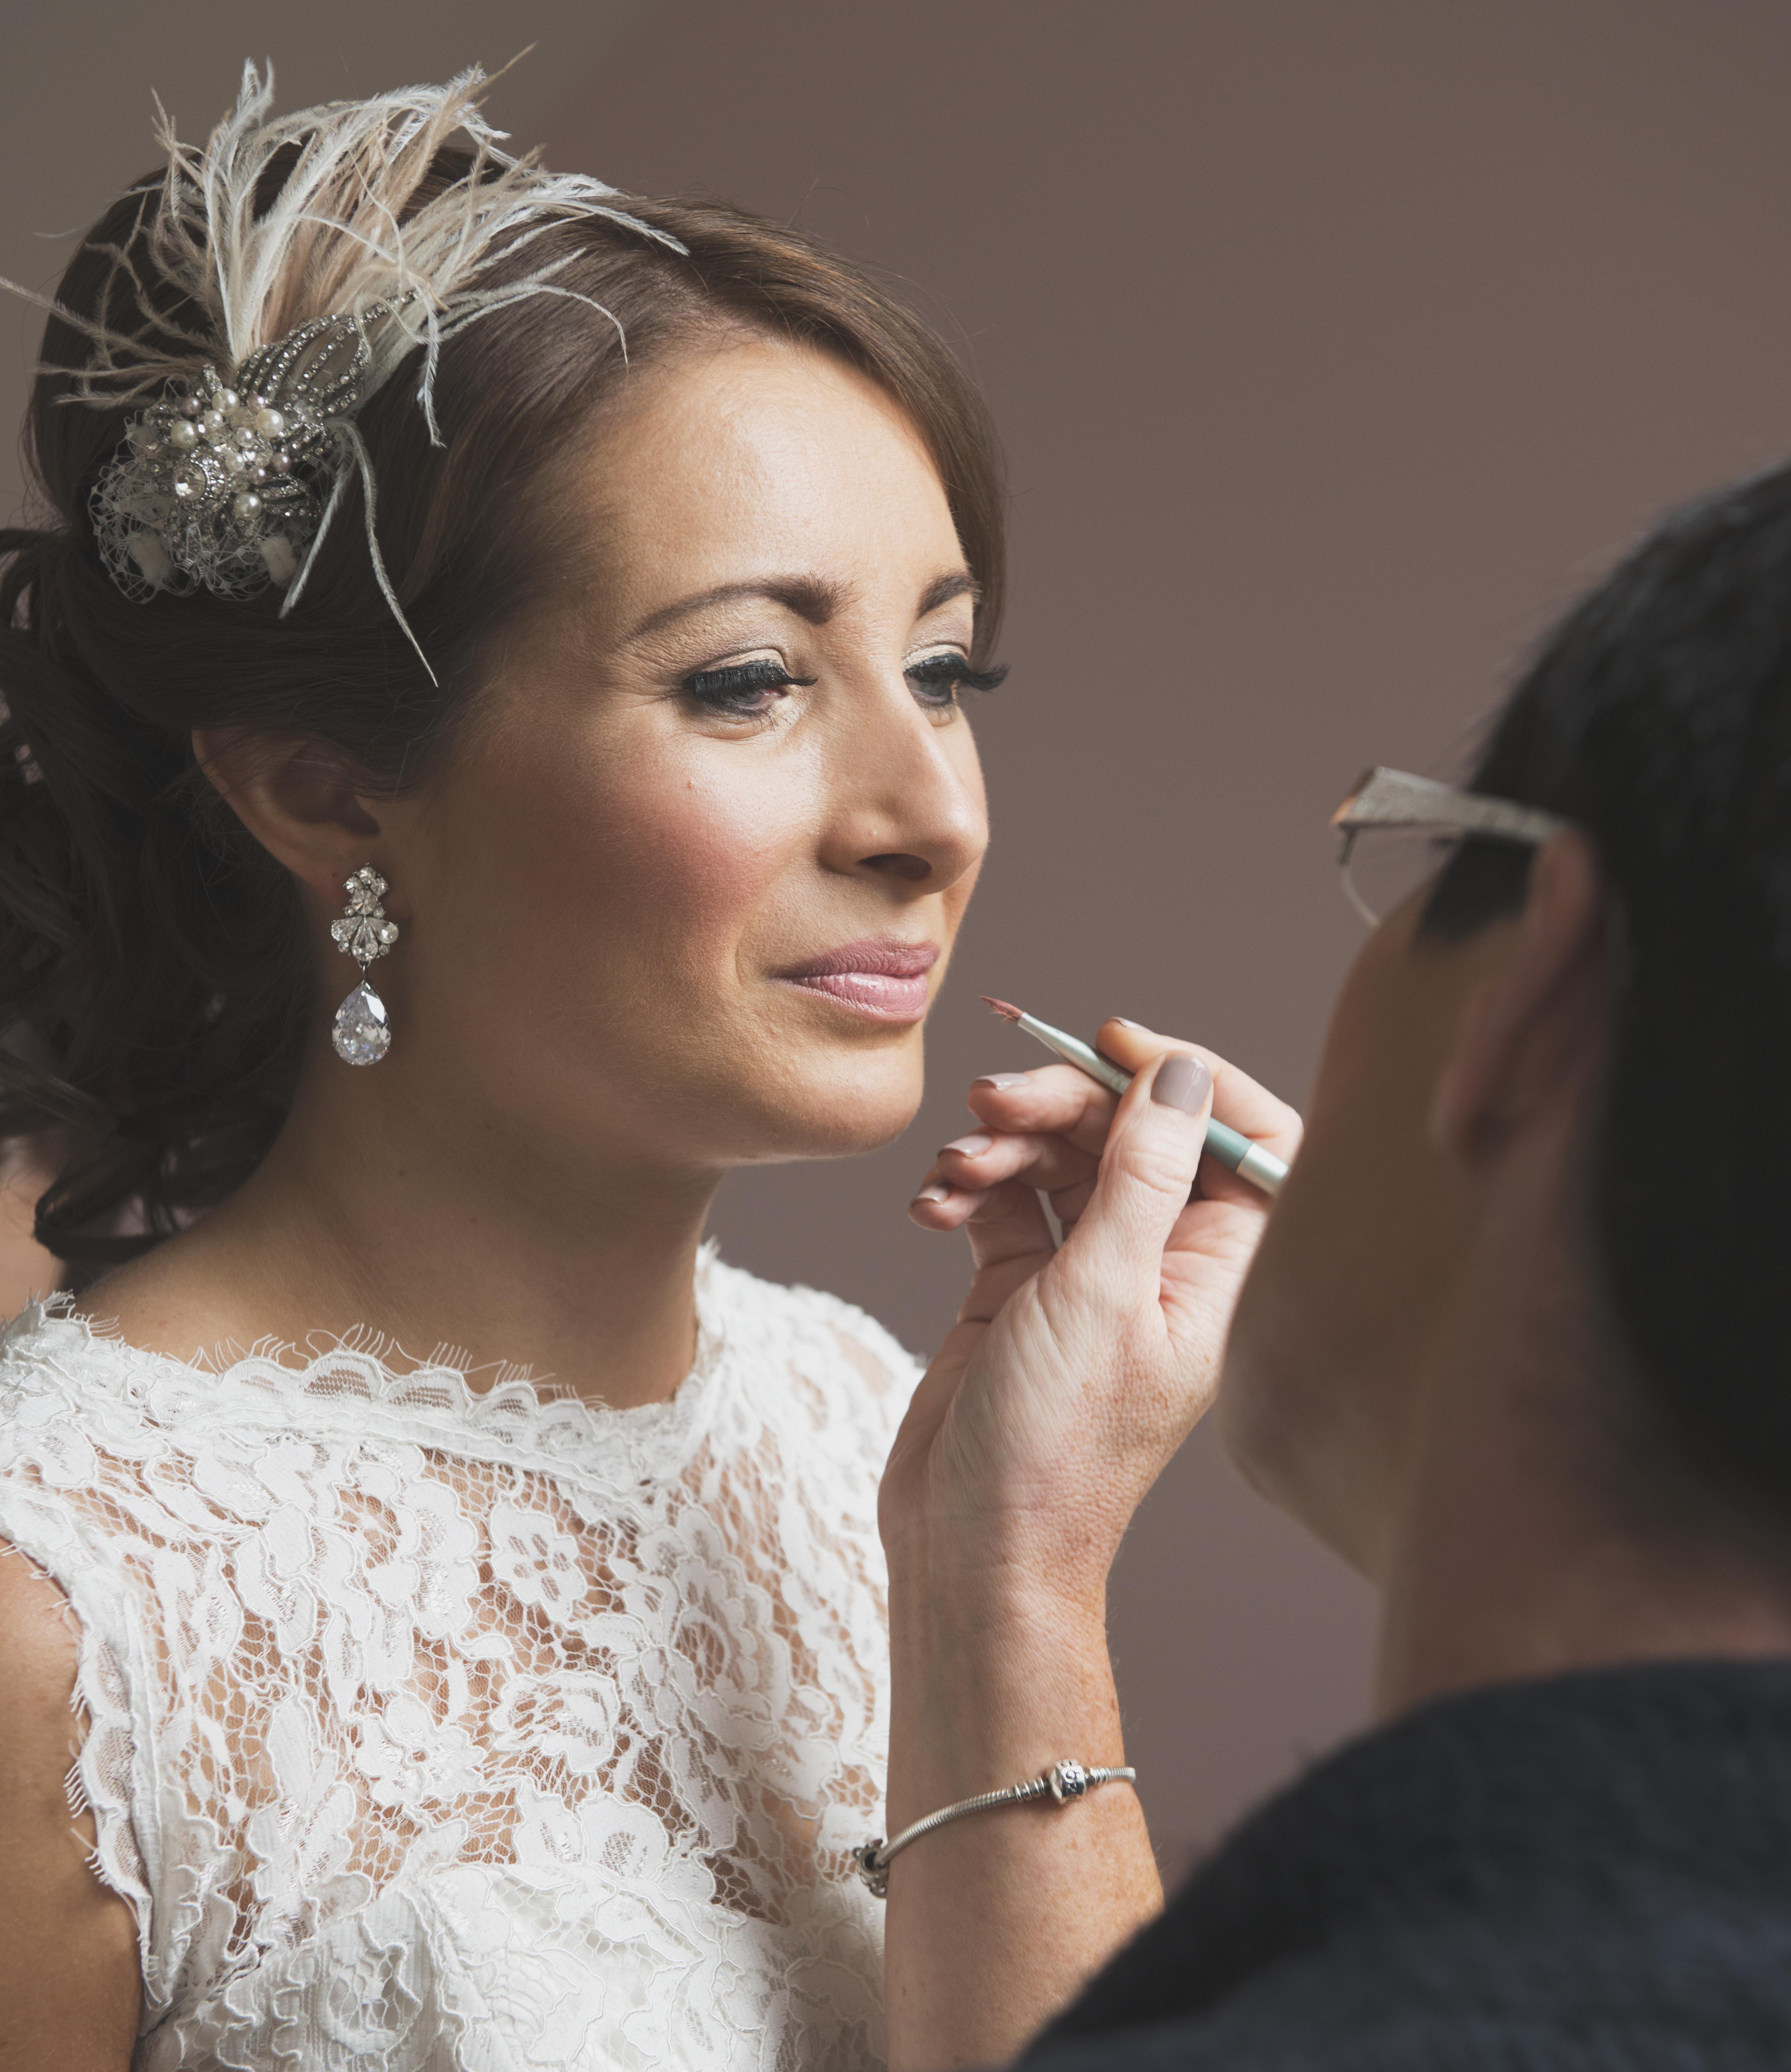 home - by kerri professional makeup artist